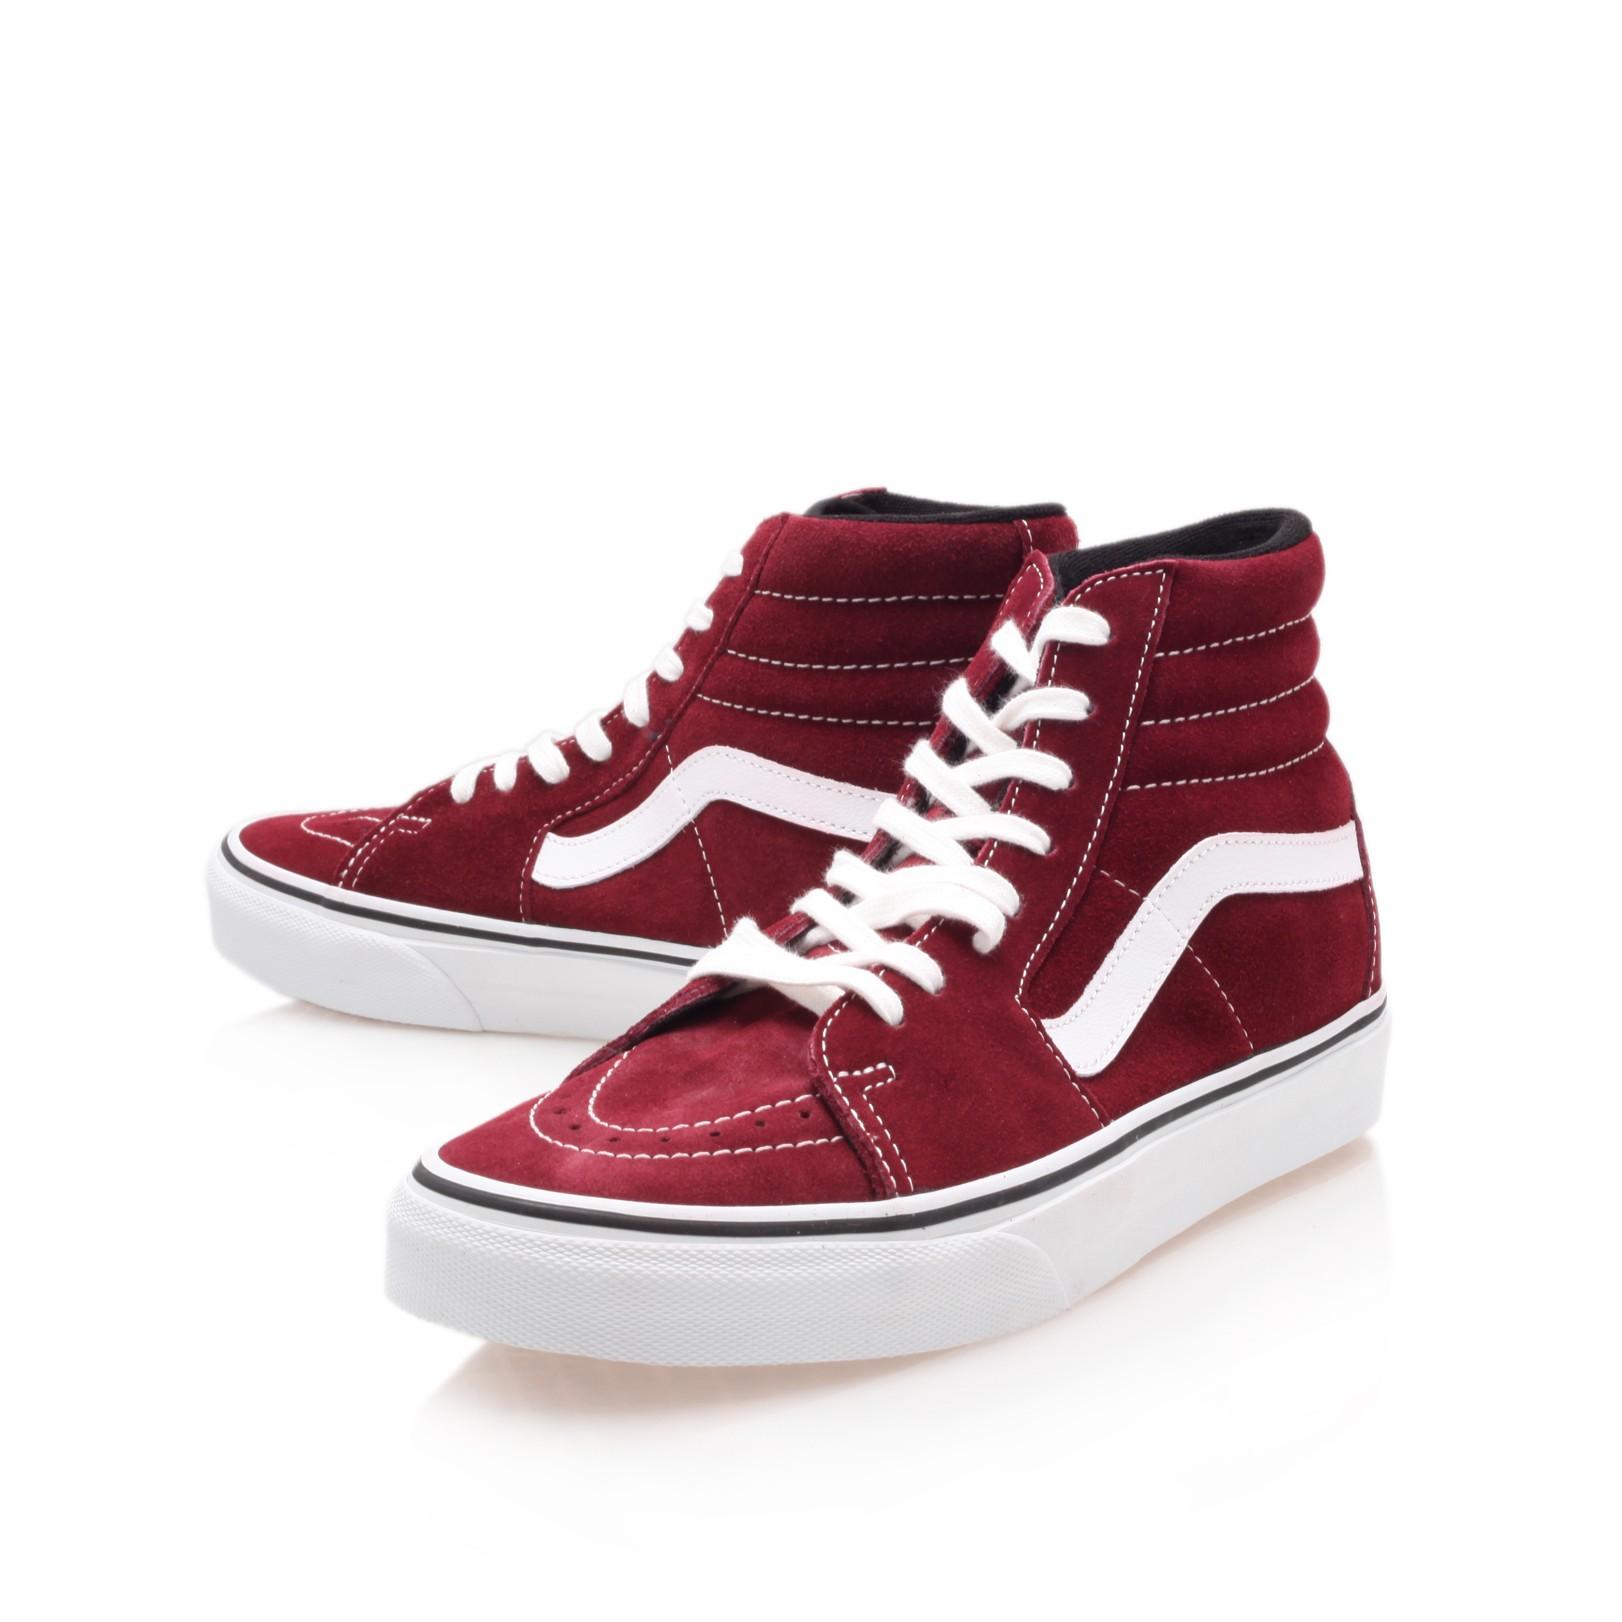 red suede high top vans buy clothes